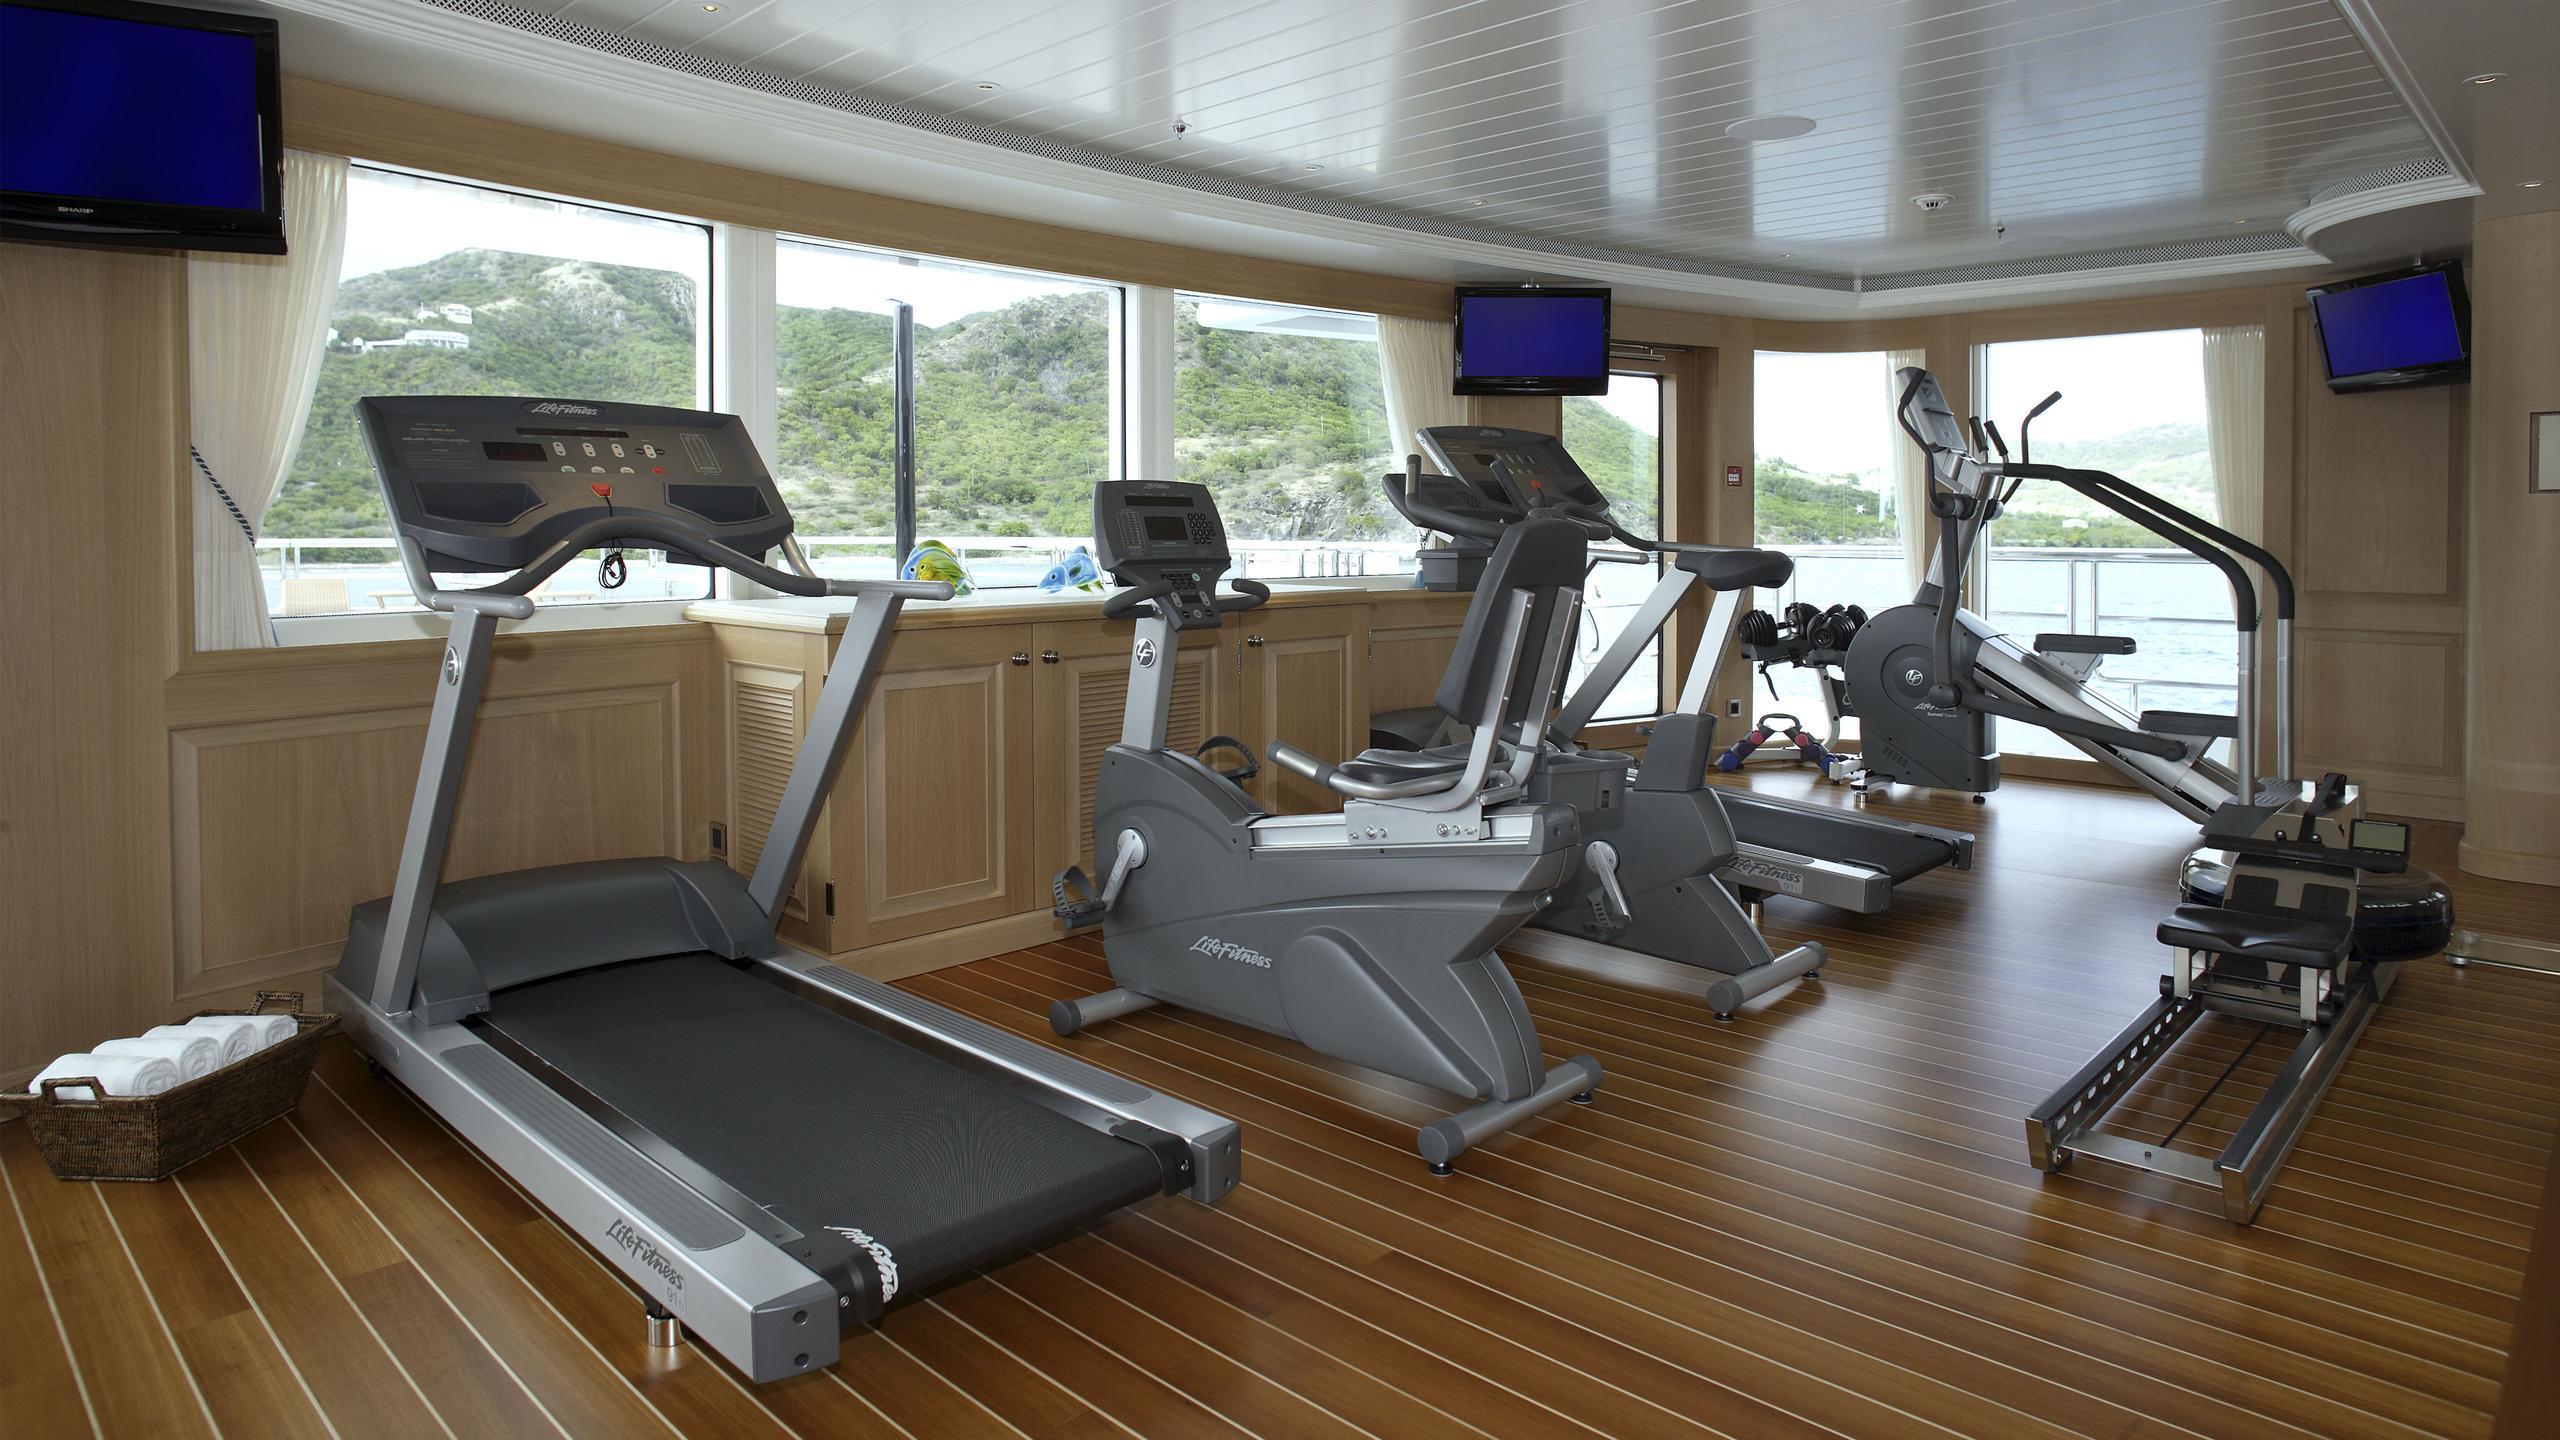 northern-star-yacht-gym